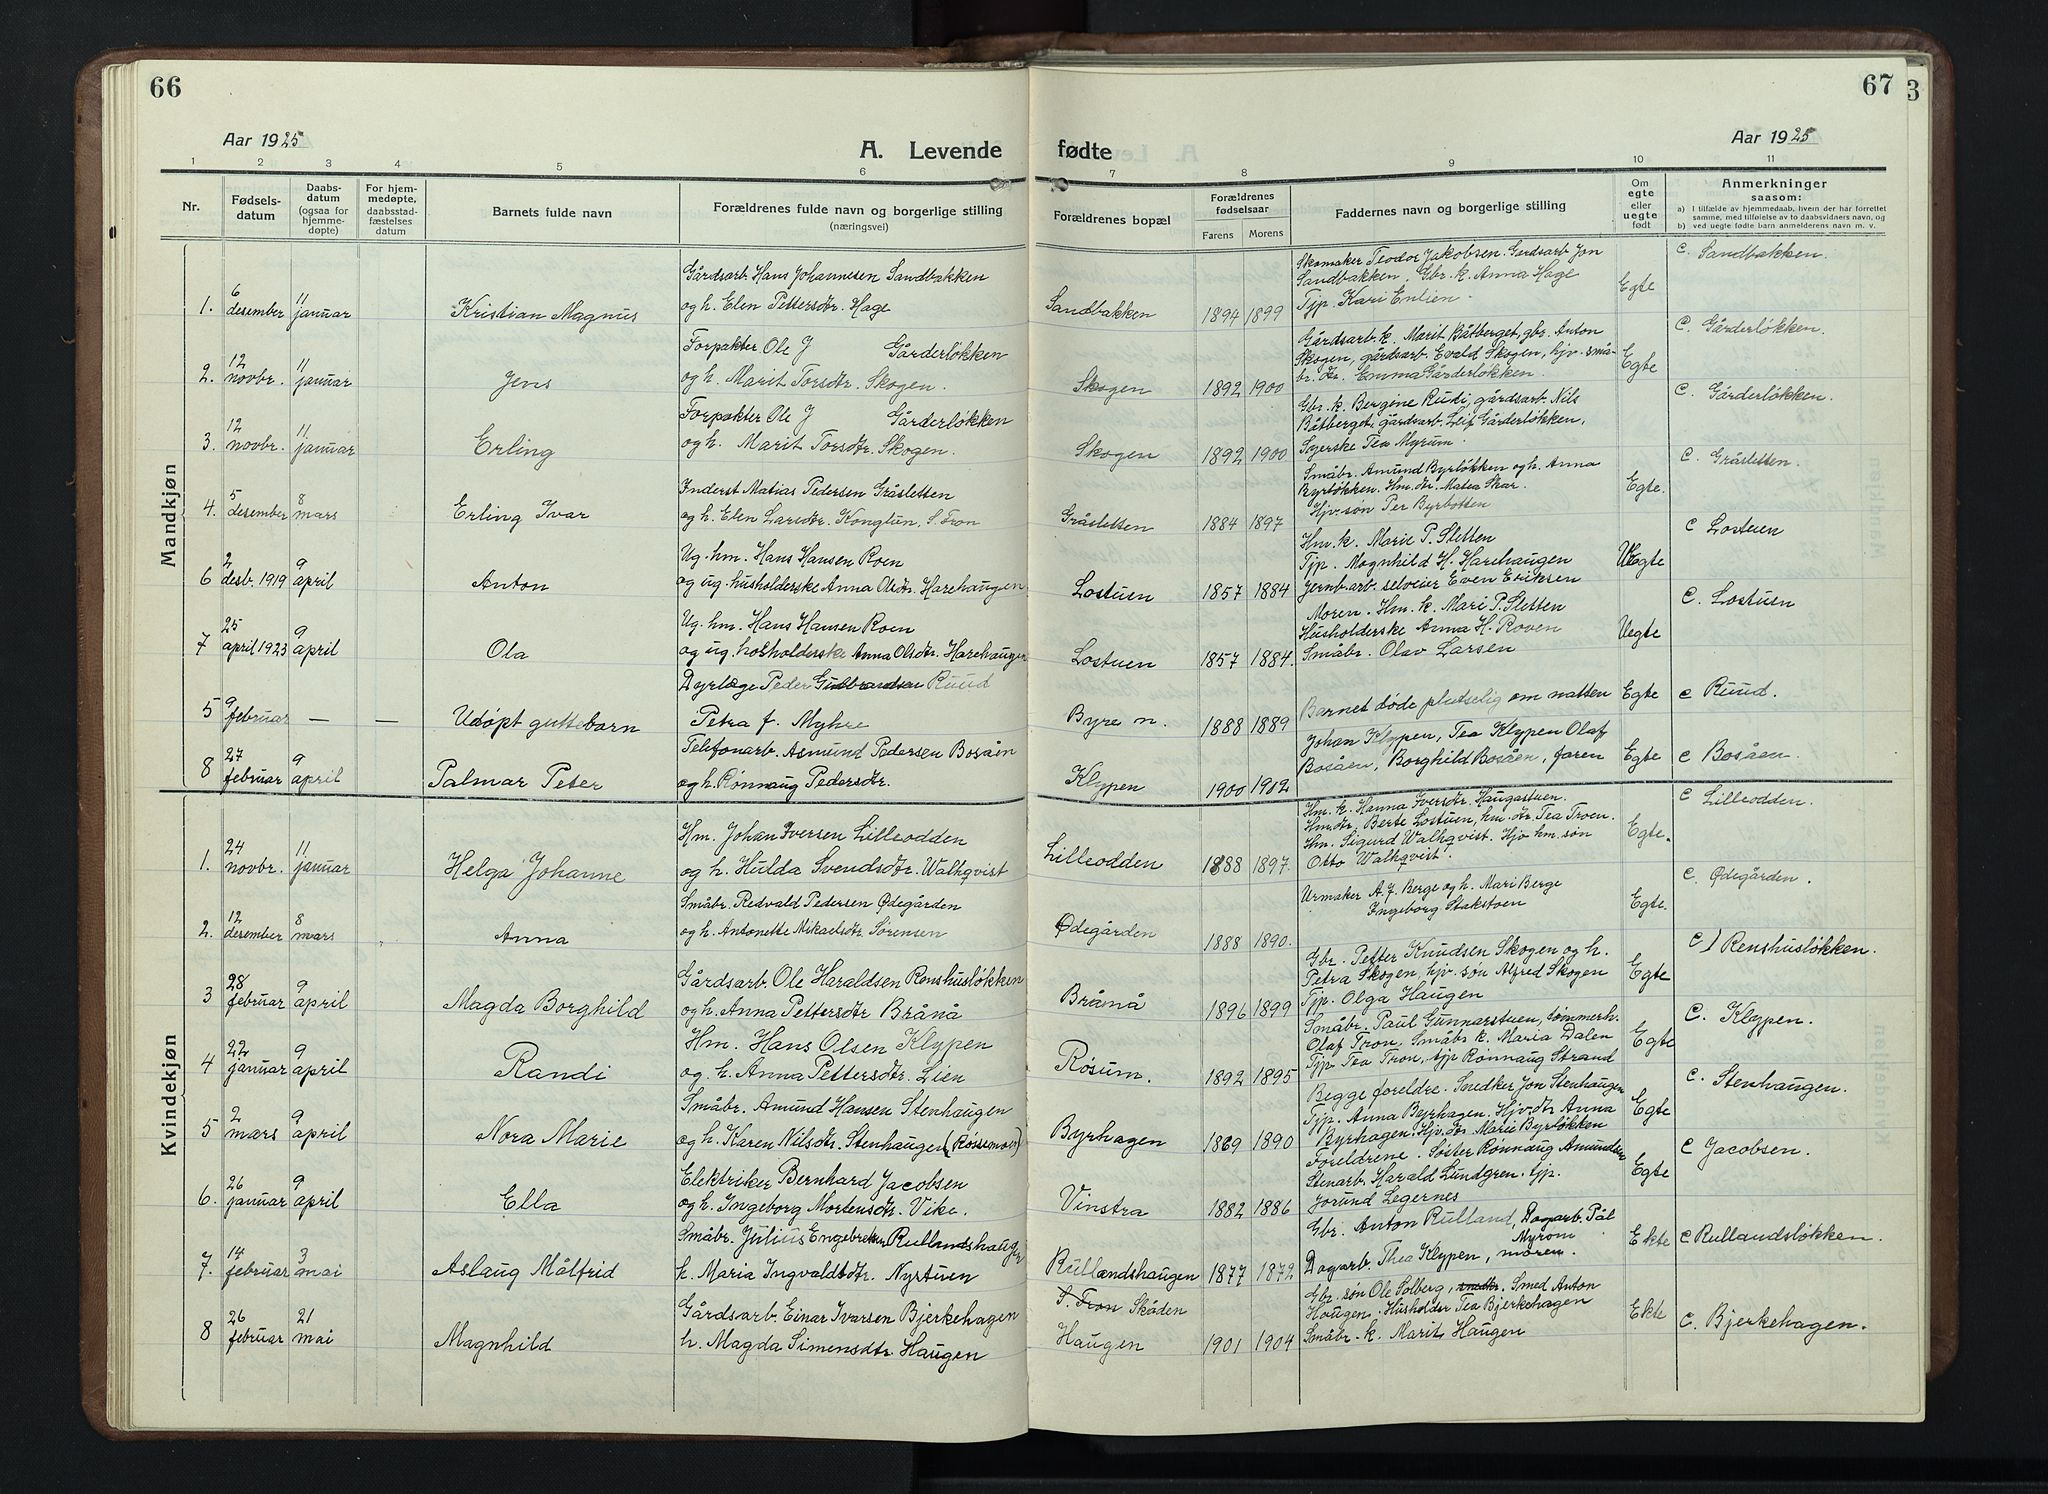 SAH, Nord-Fron prestekontor, Klokkerbok nr. 7, 1915-1946, s. 66-67